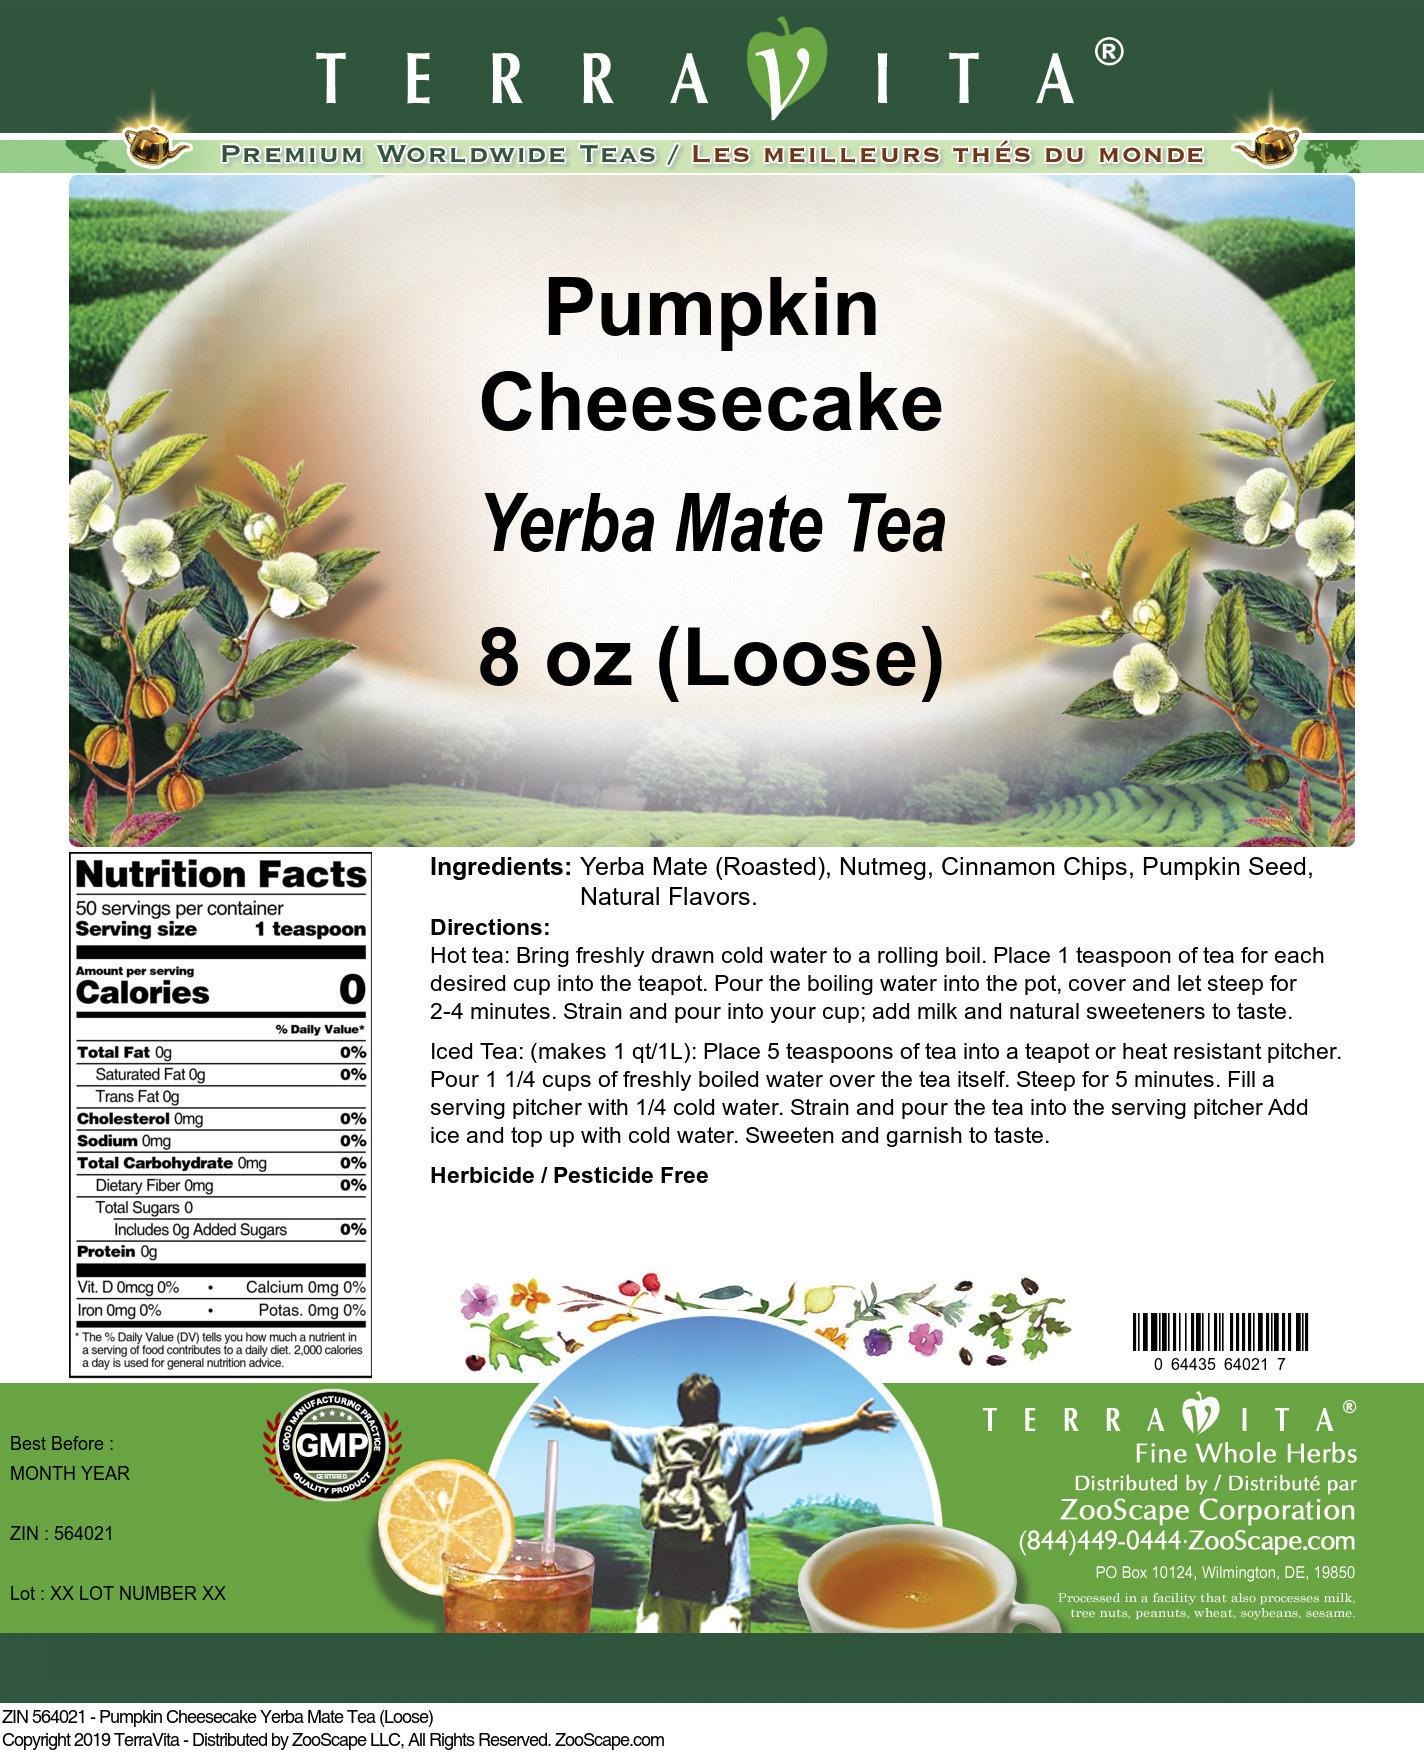 Pumpkin Cheesecake Yerba Mate Tea (Loose)